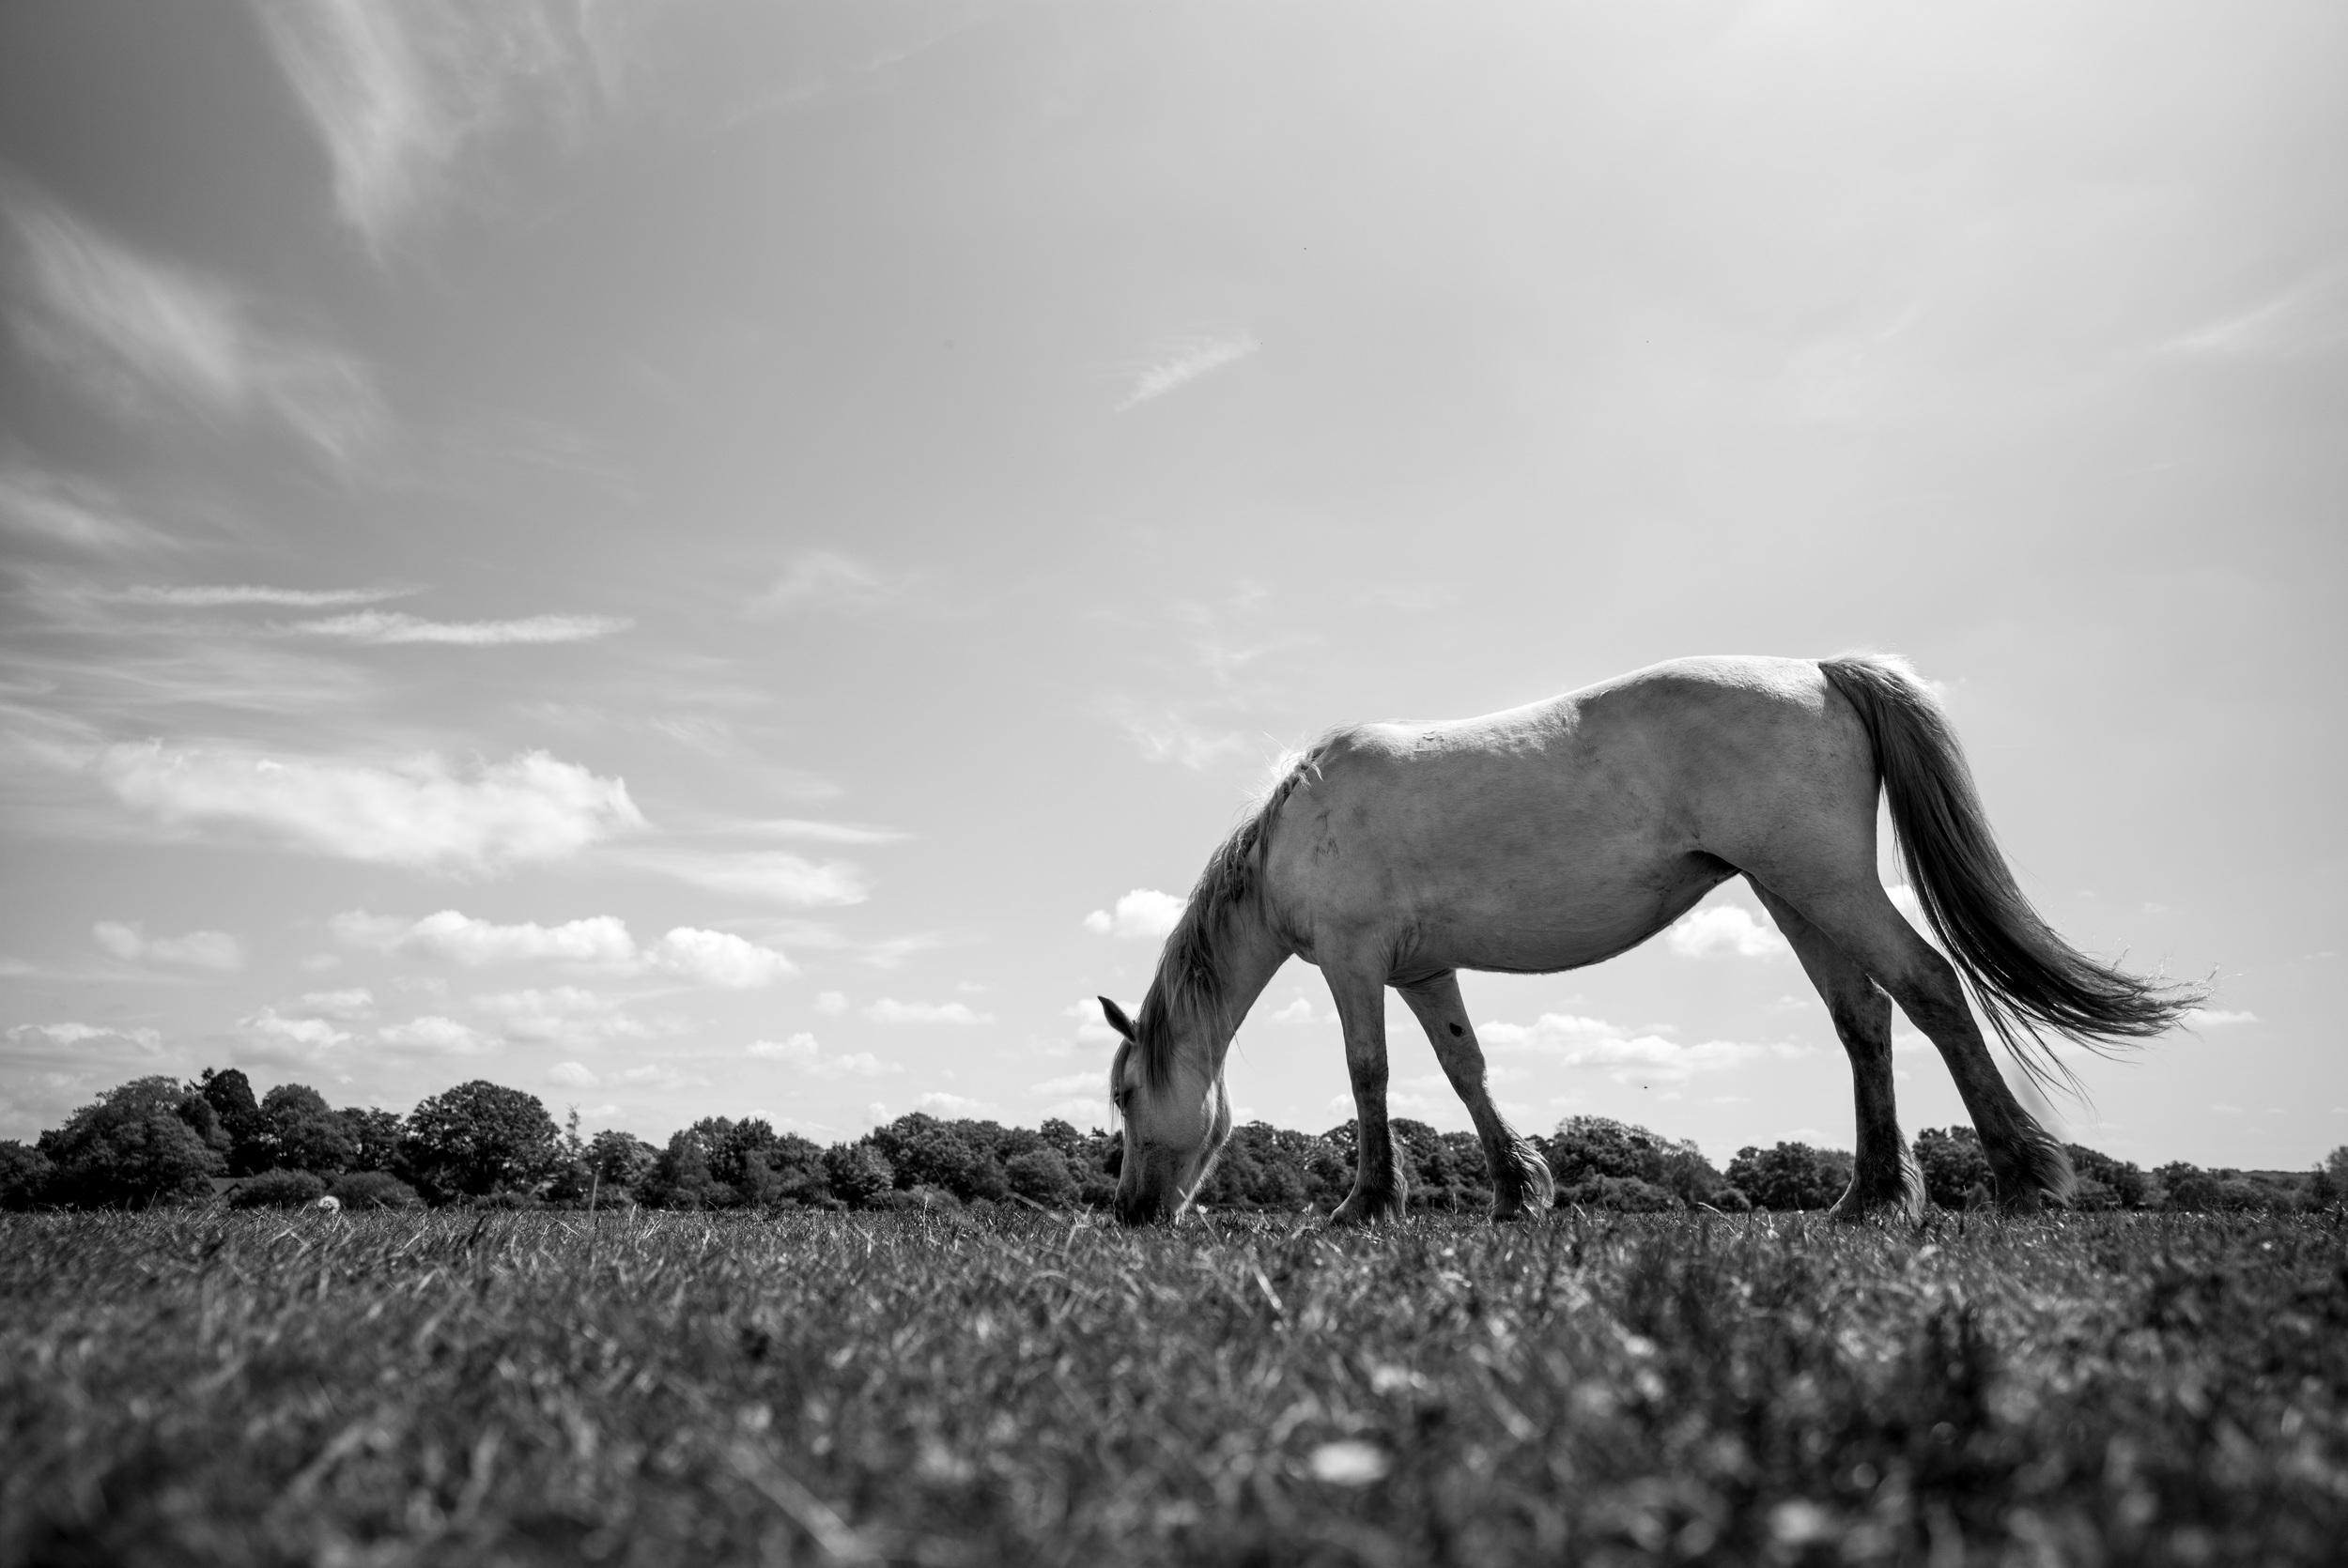 Epic pony shot. I love this lens so much. (Leica Super-Elmar-M 21mm f/3.4 ASPH.)